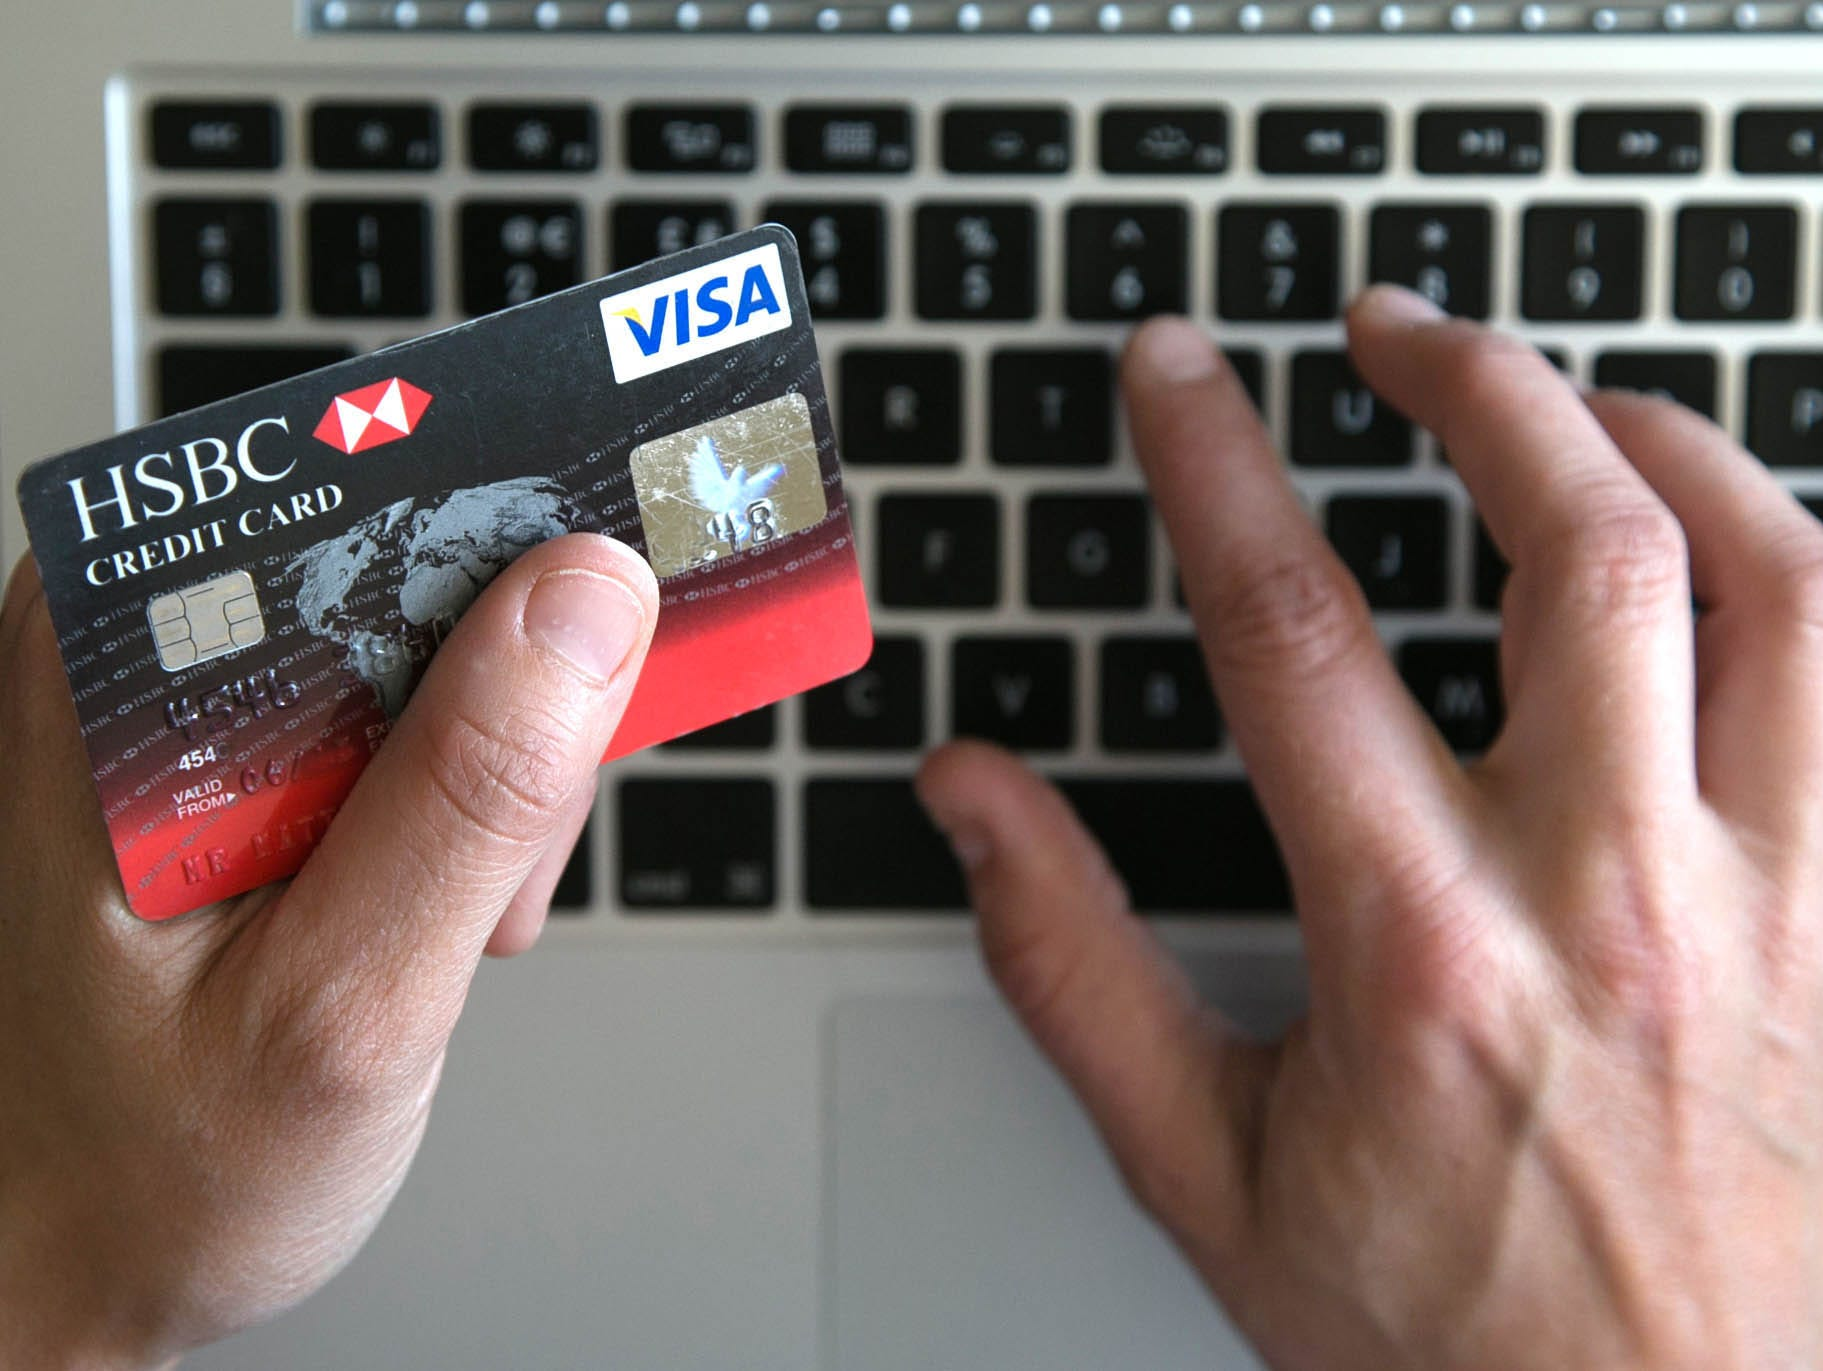 capital one credit card application rejected кредит сбербанка для физических лиц в 2020 году калькулятор